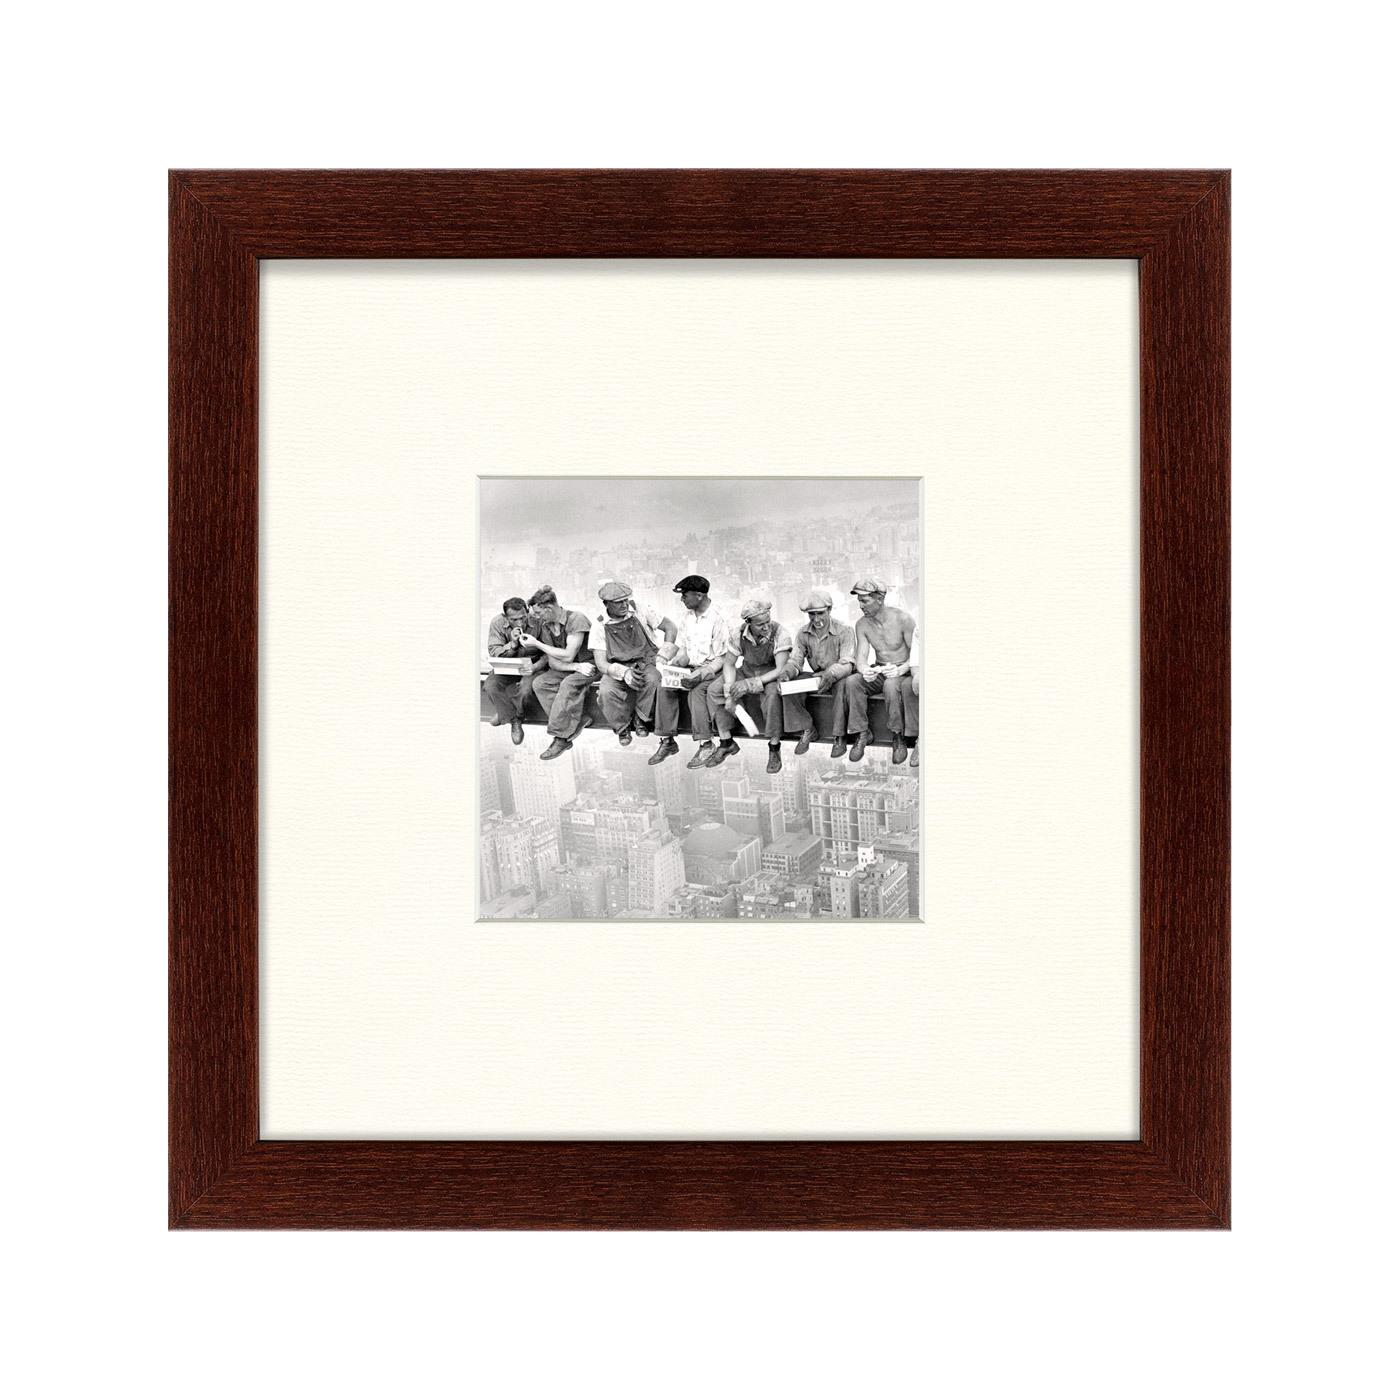 {} Картины в Квартиру Картина Обед На Небоскрёбе (35х35 см) картины в квартиру картина каллы 2 35х35 см